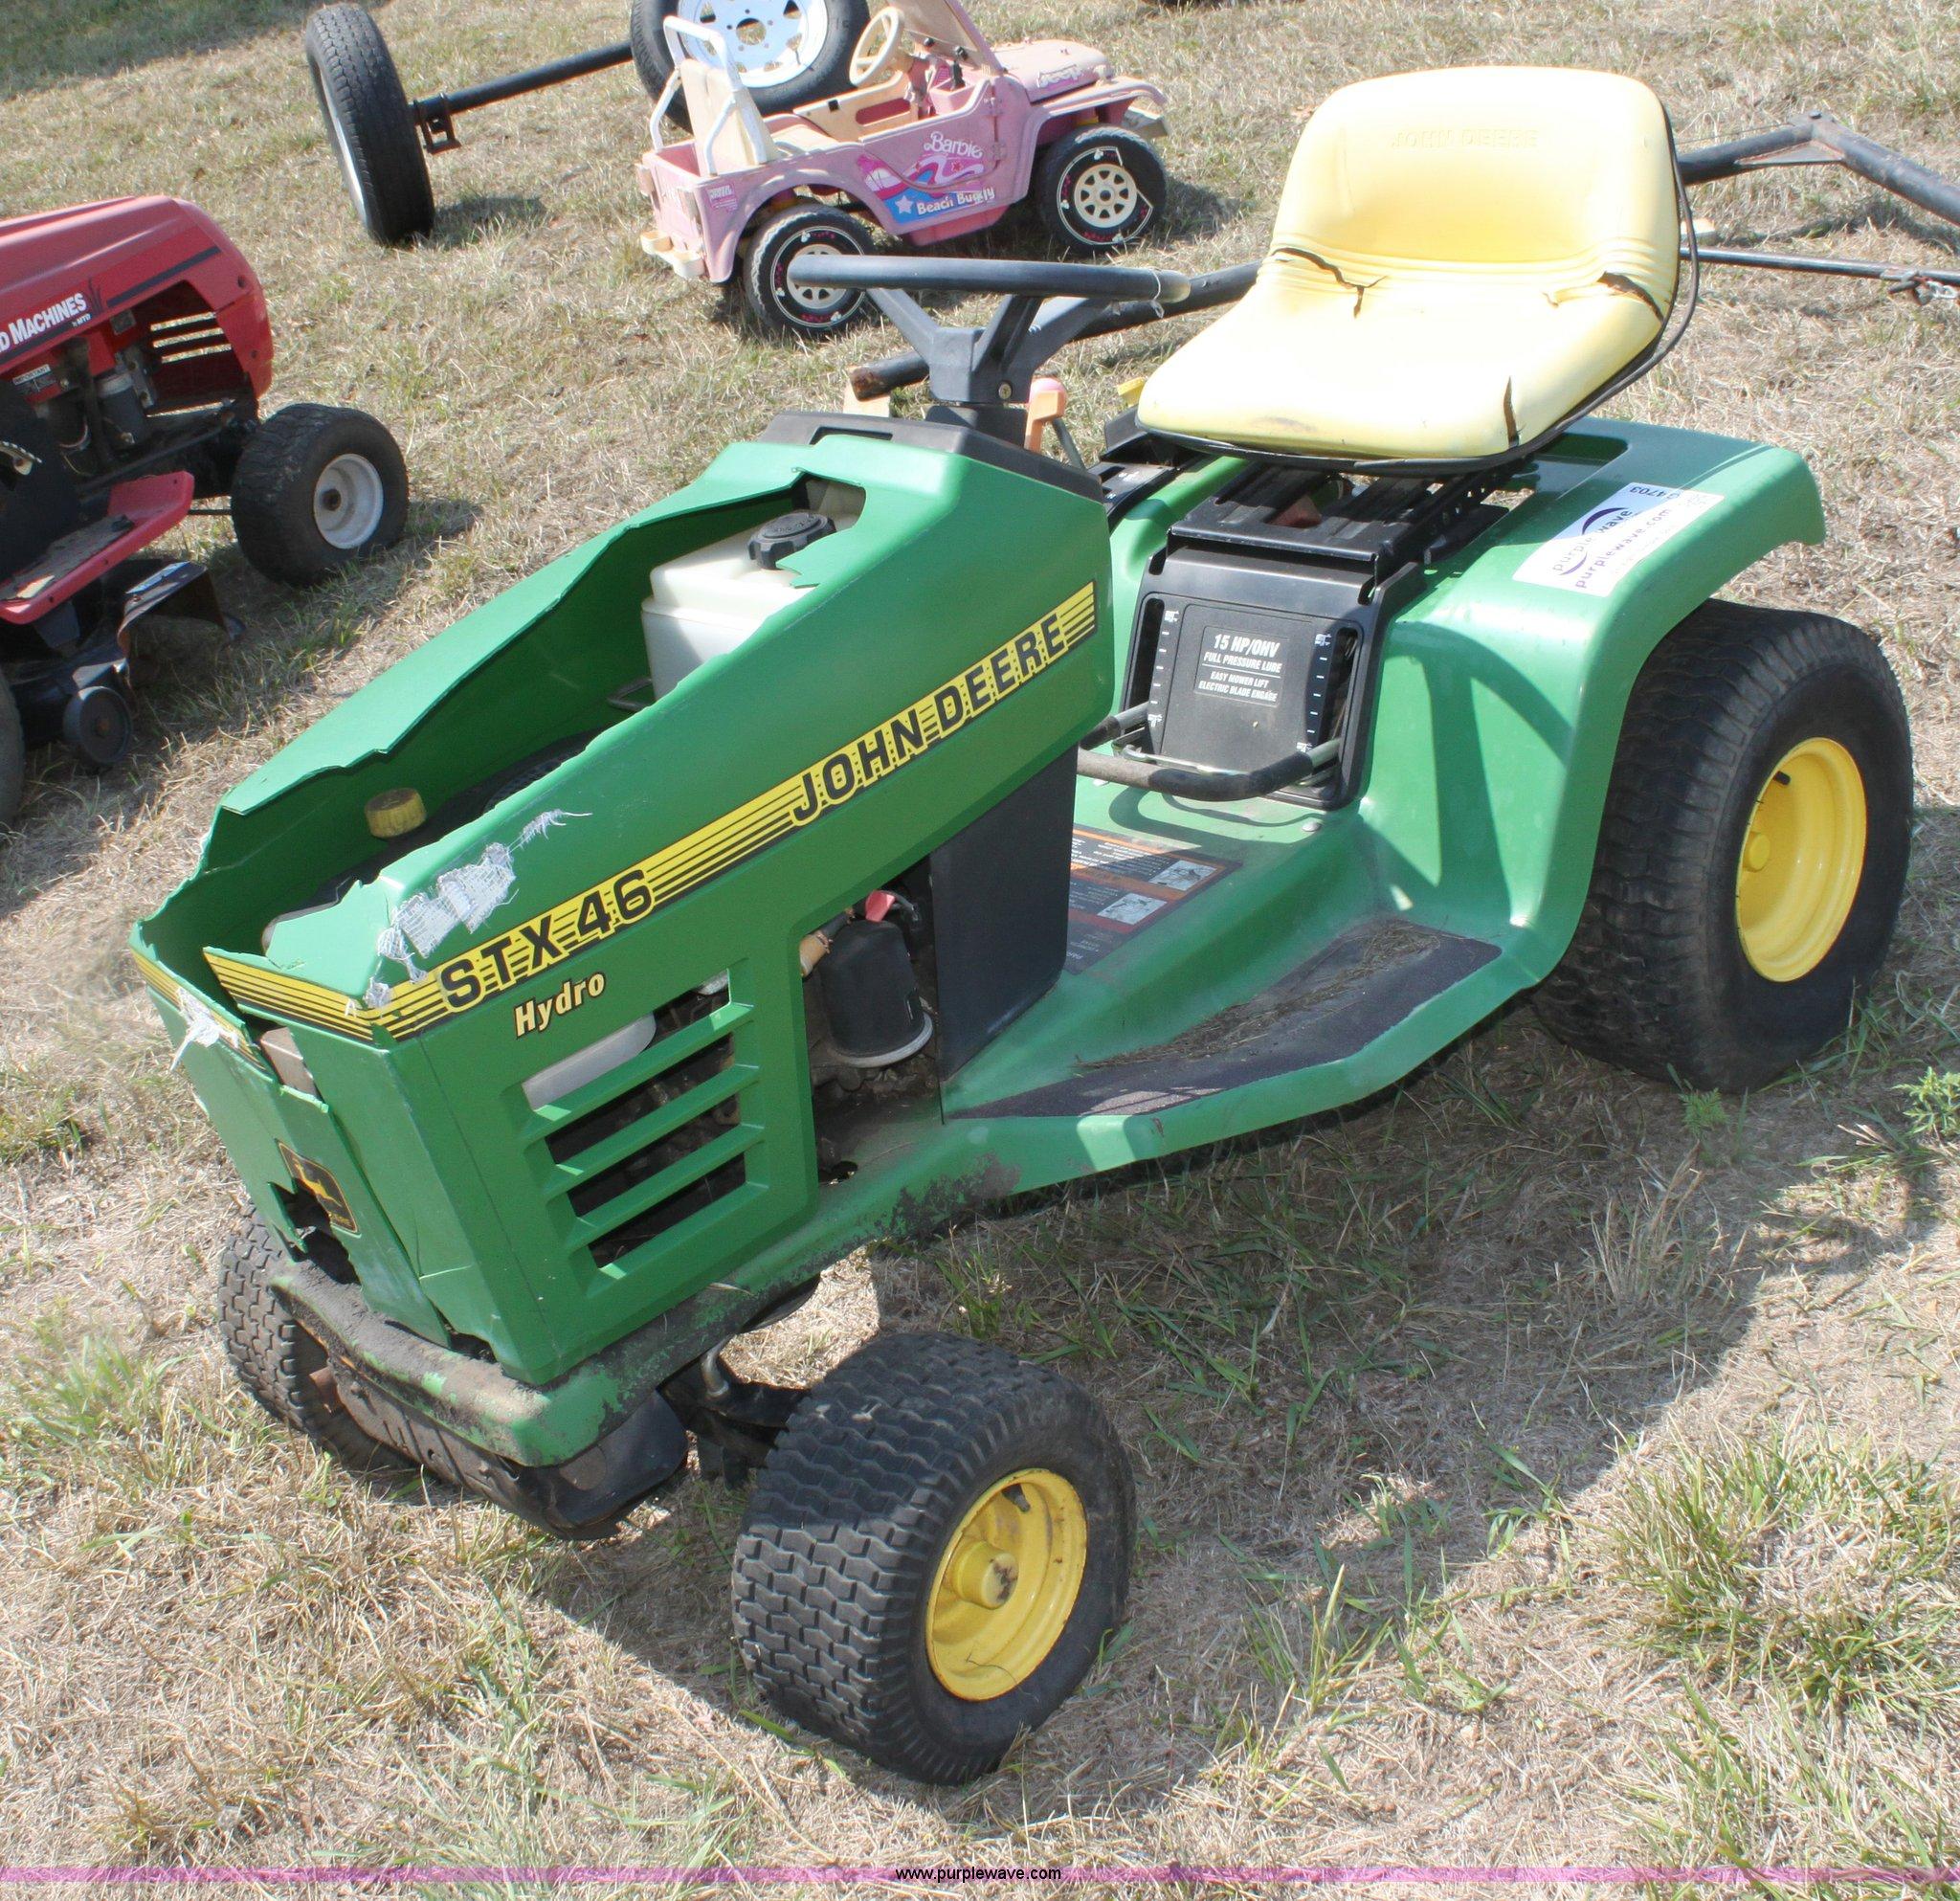 John Deere Stx46 Wiring Diagrams 1119 X 1537 Gif 639kb Diagram Carburetor Schema For Tecumseh Lawn Mower Item G4703 Sold September 1 Rh Purplewave Com